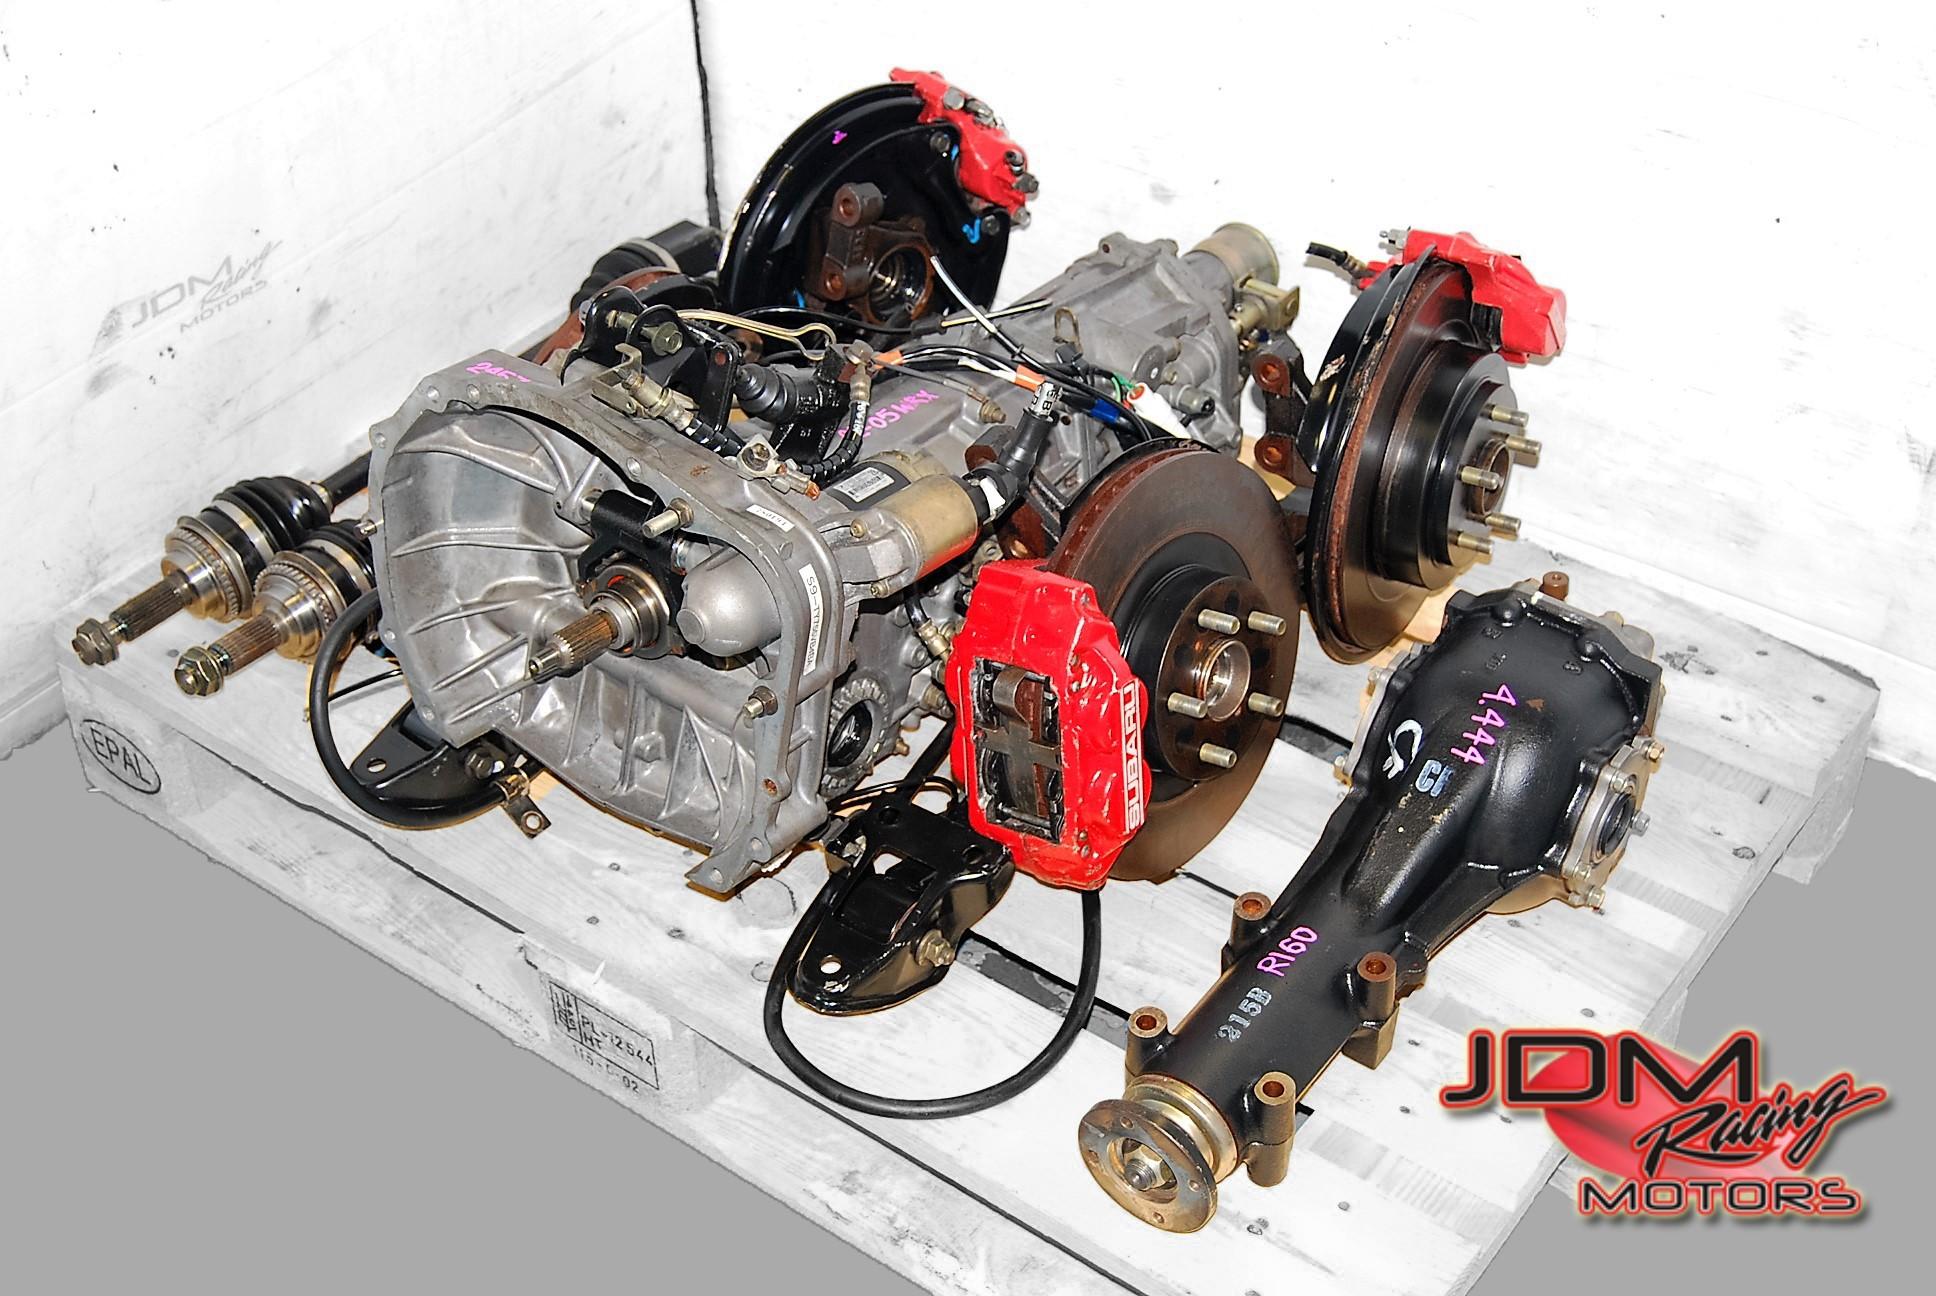 Subaru Jdm Engines Parts Racing Motors 2008 Boxer Engine Diagram Impreza Wrx 5mt Manual Transmissions